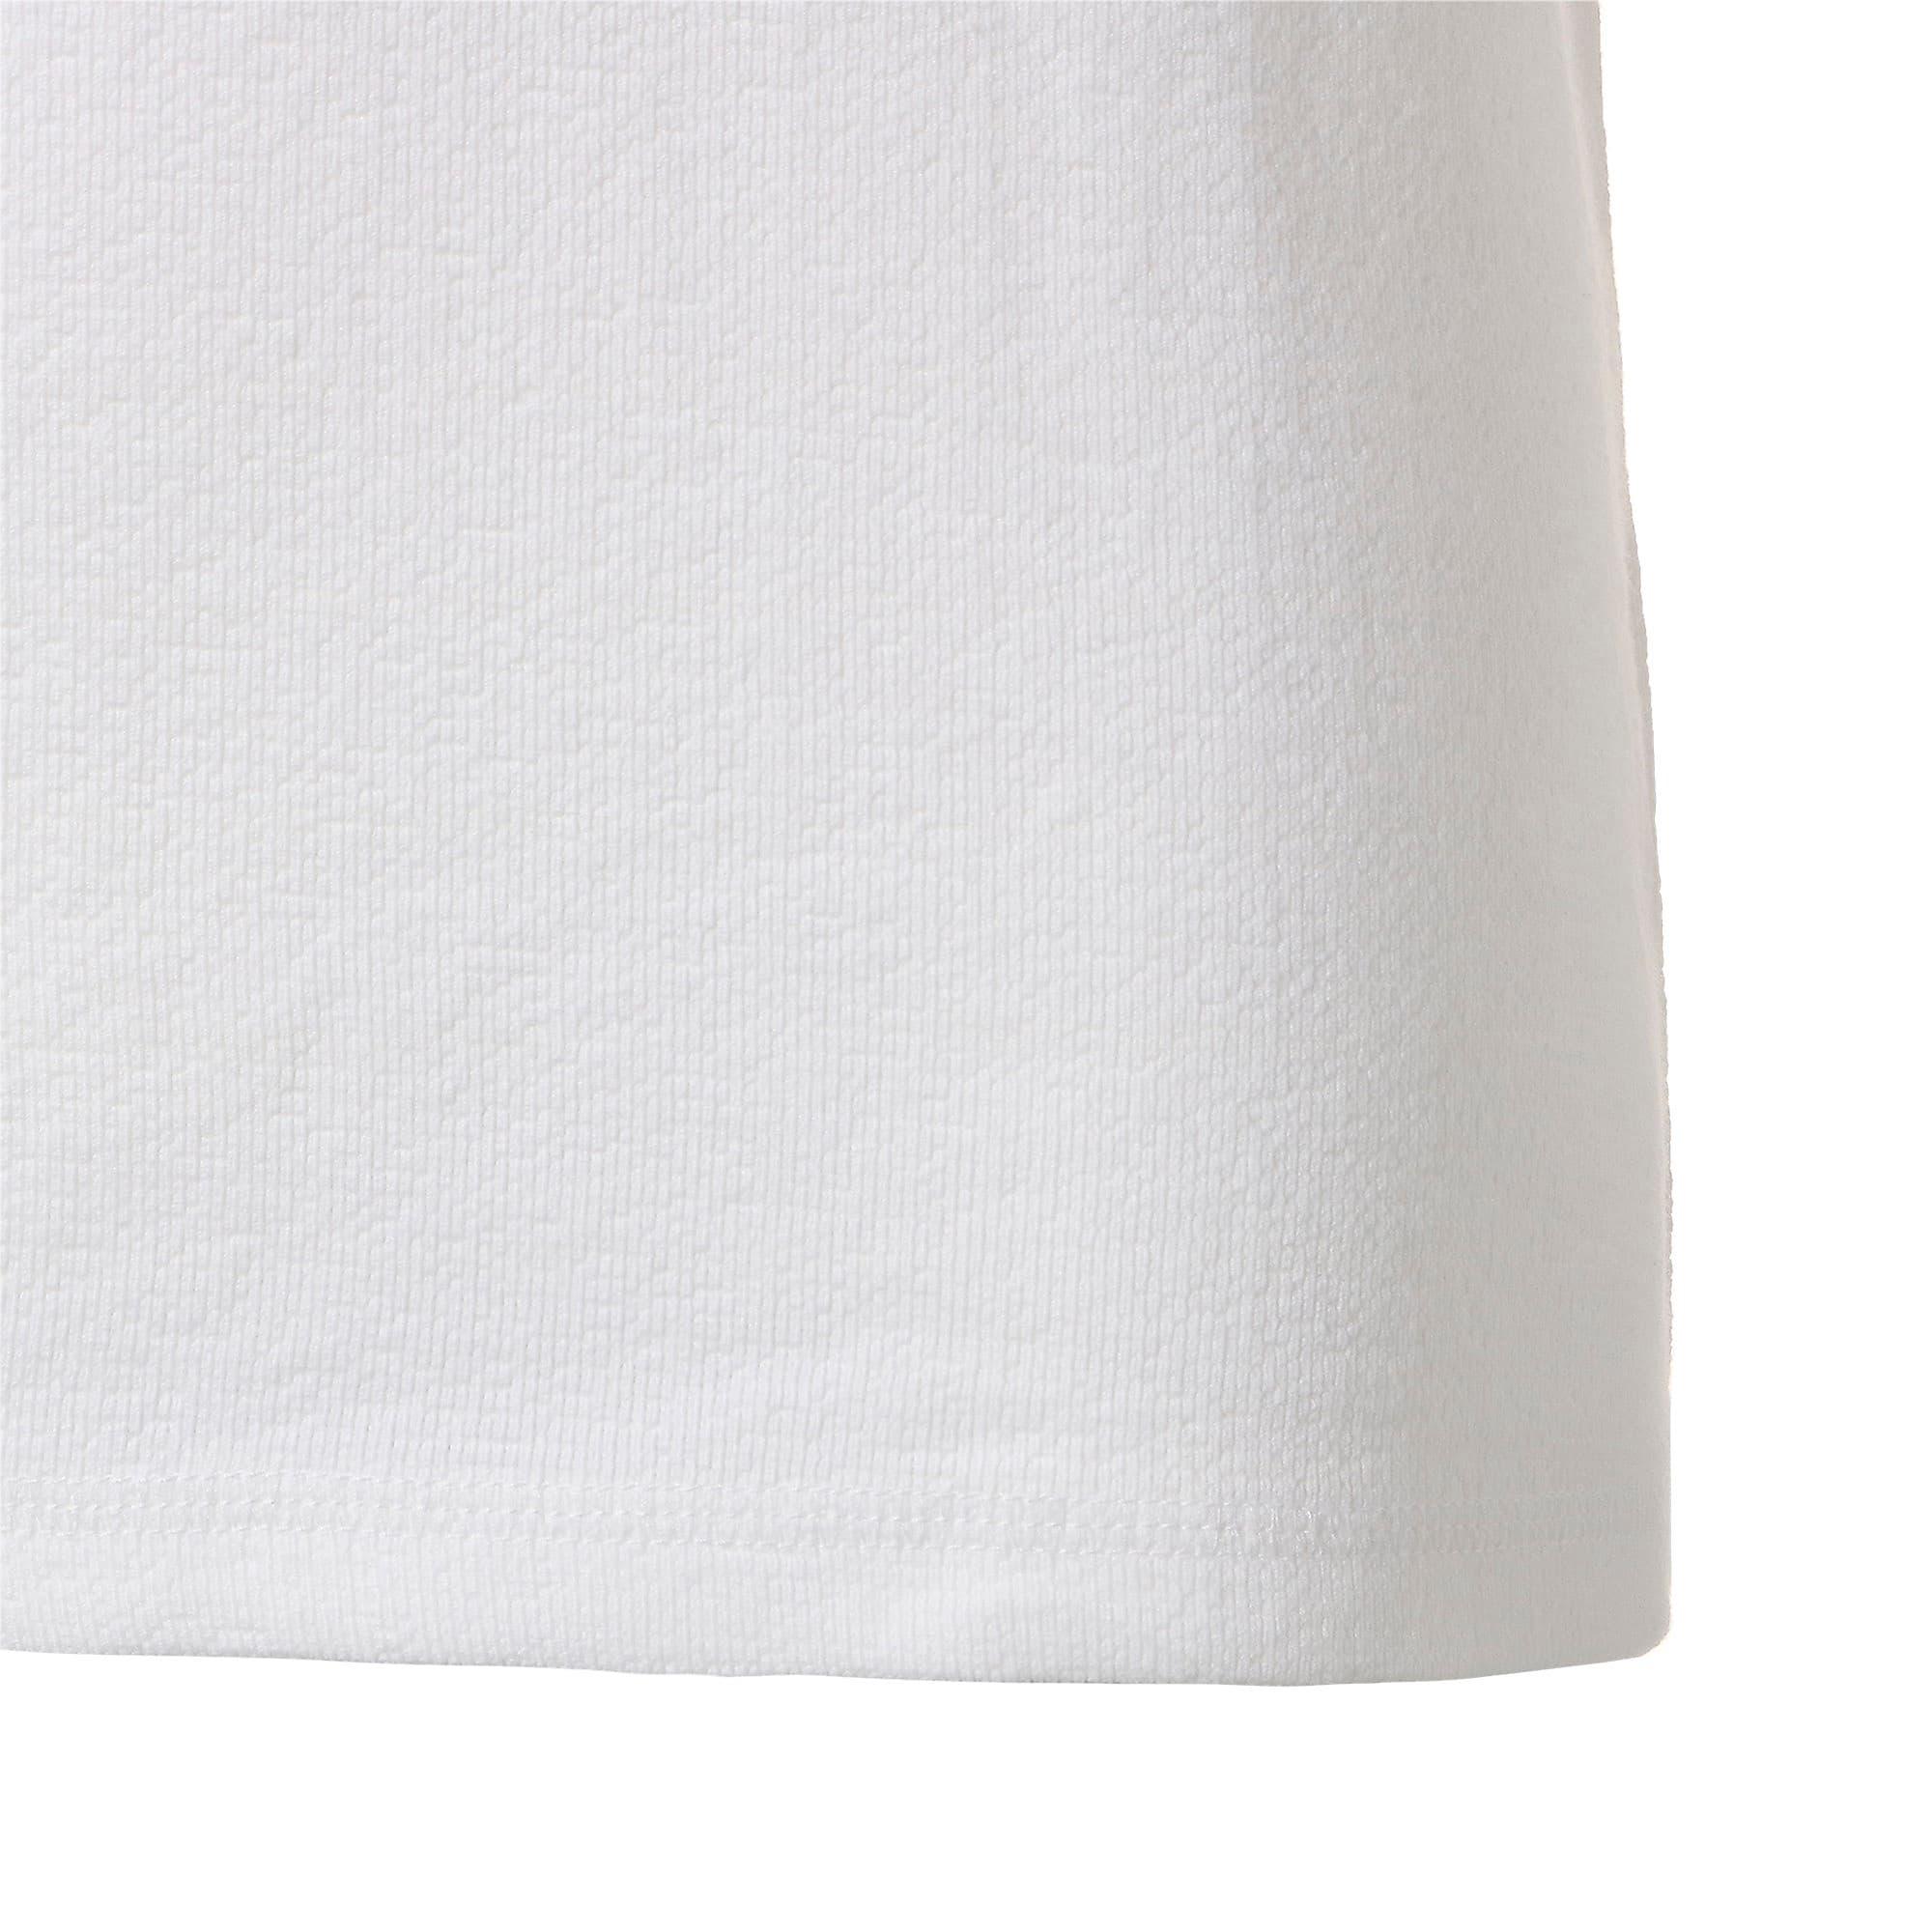 Thumbnail 6 of PUMA x TYAKASHA Tシャツ, Puma White, medium-JPN